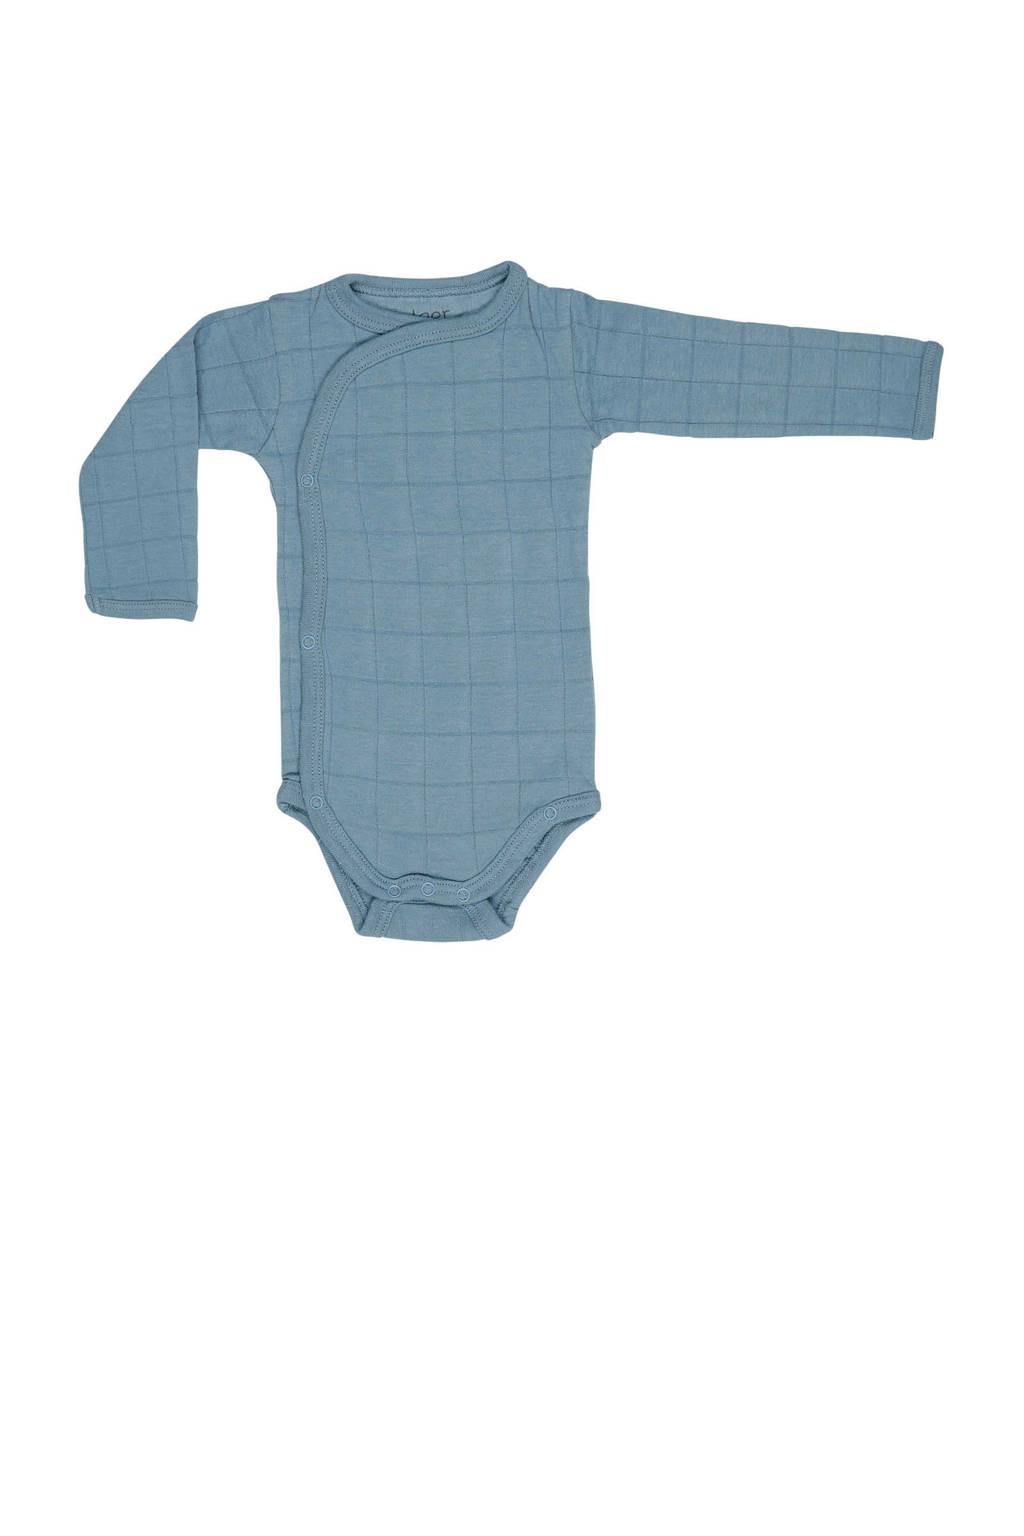 Lodger newborn baby romper Solid, Blauw